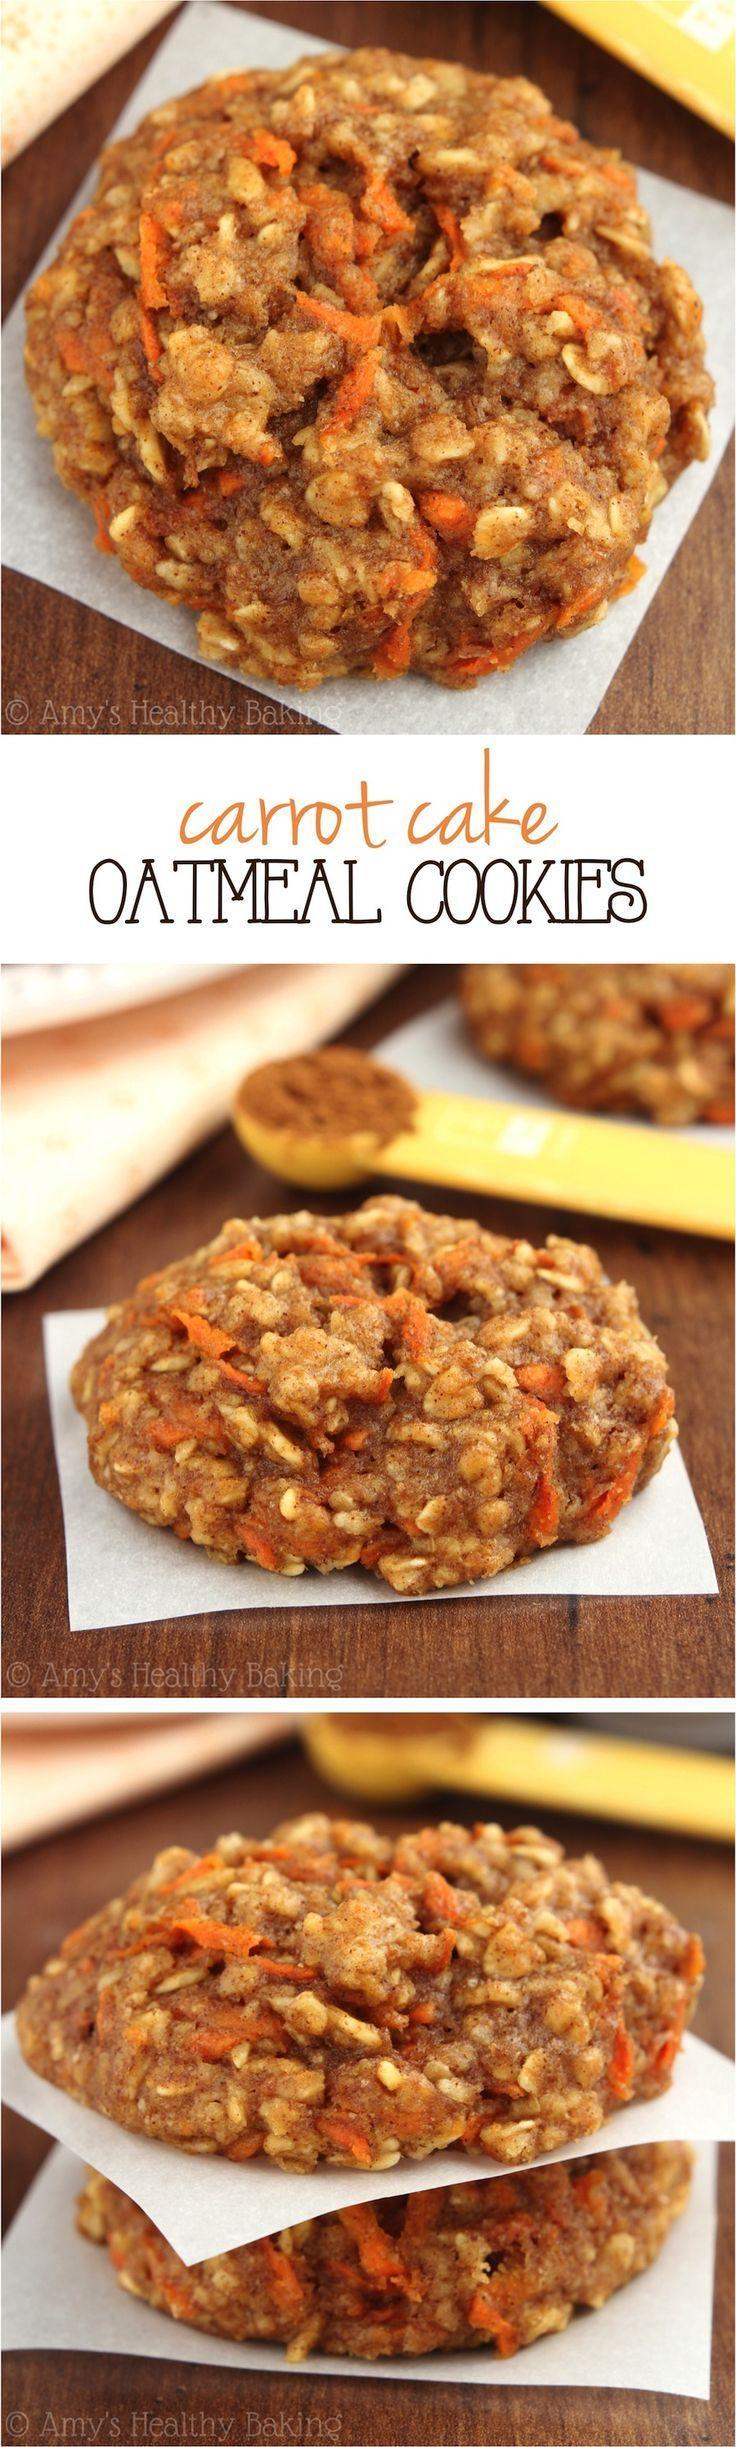 Pin Ups: Carrot Cake Oatmeal Cookies| http://knittedbliss.com